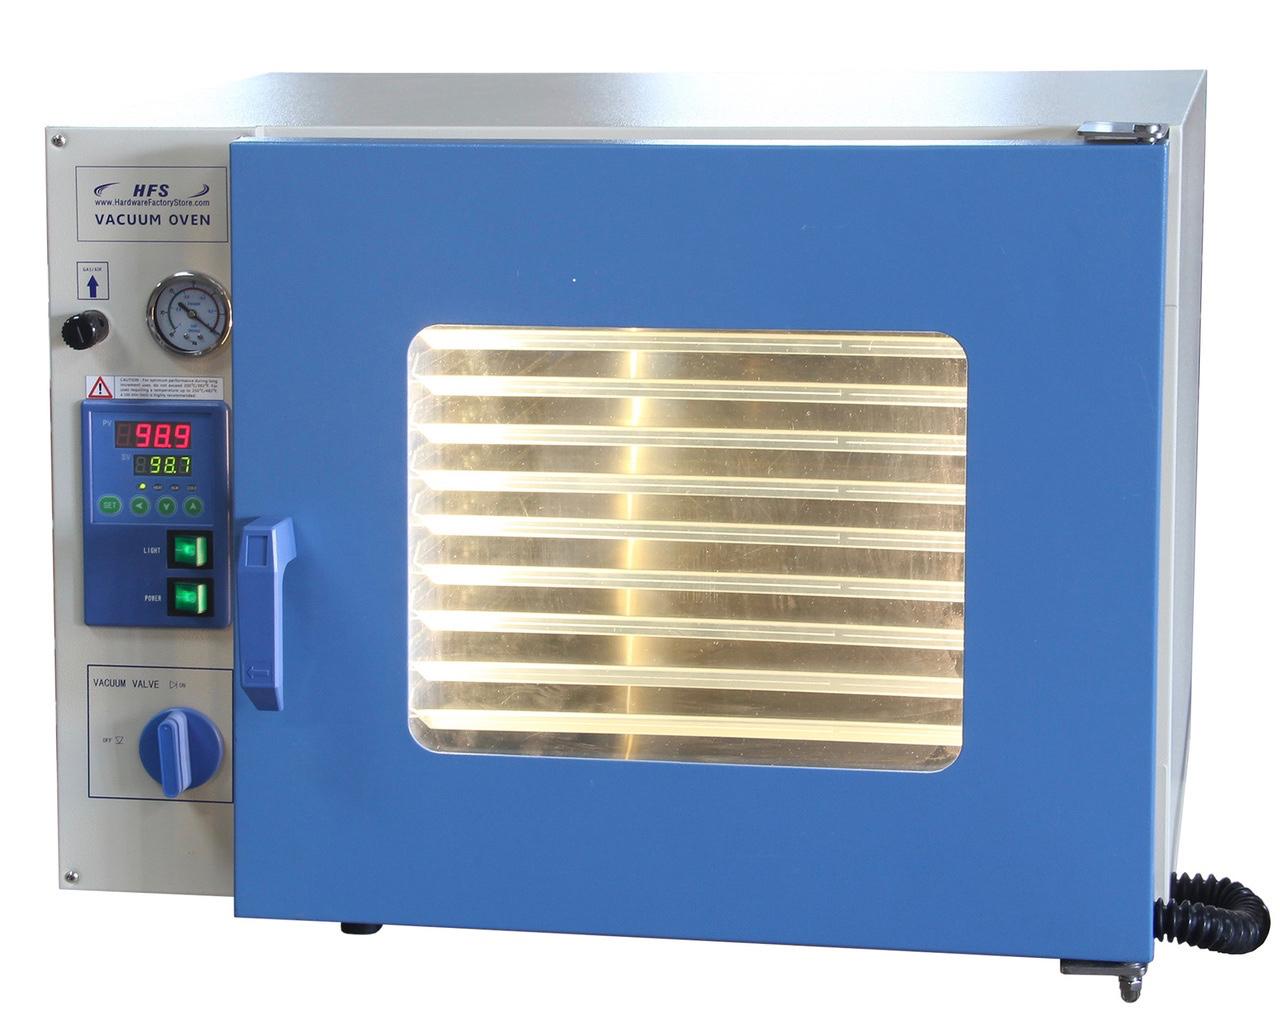 HFS 1.9 Vacuum Oven